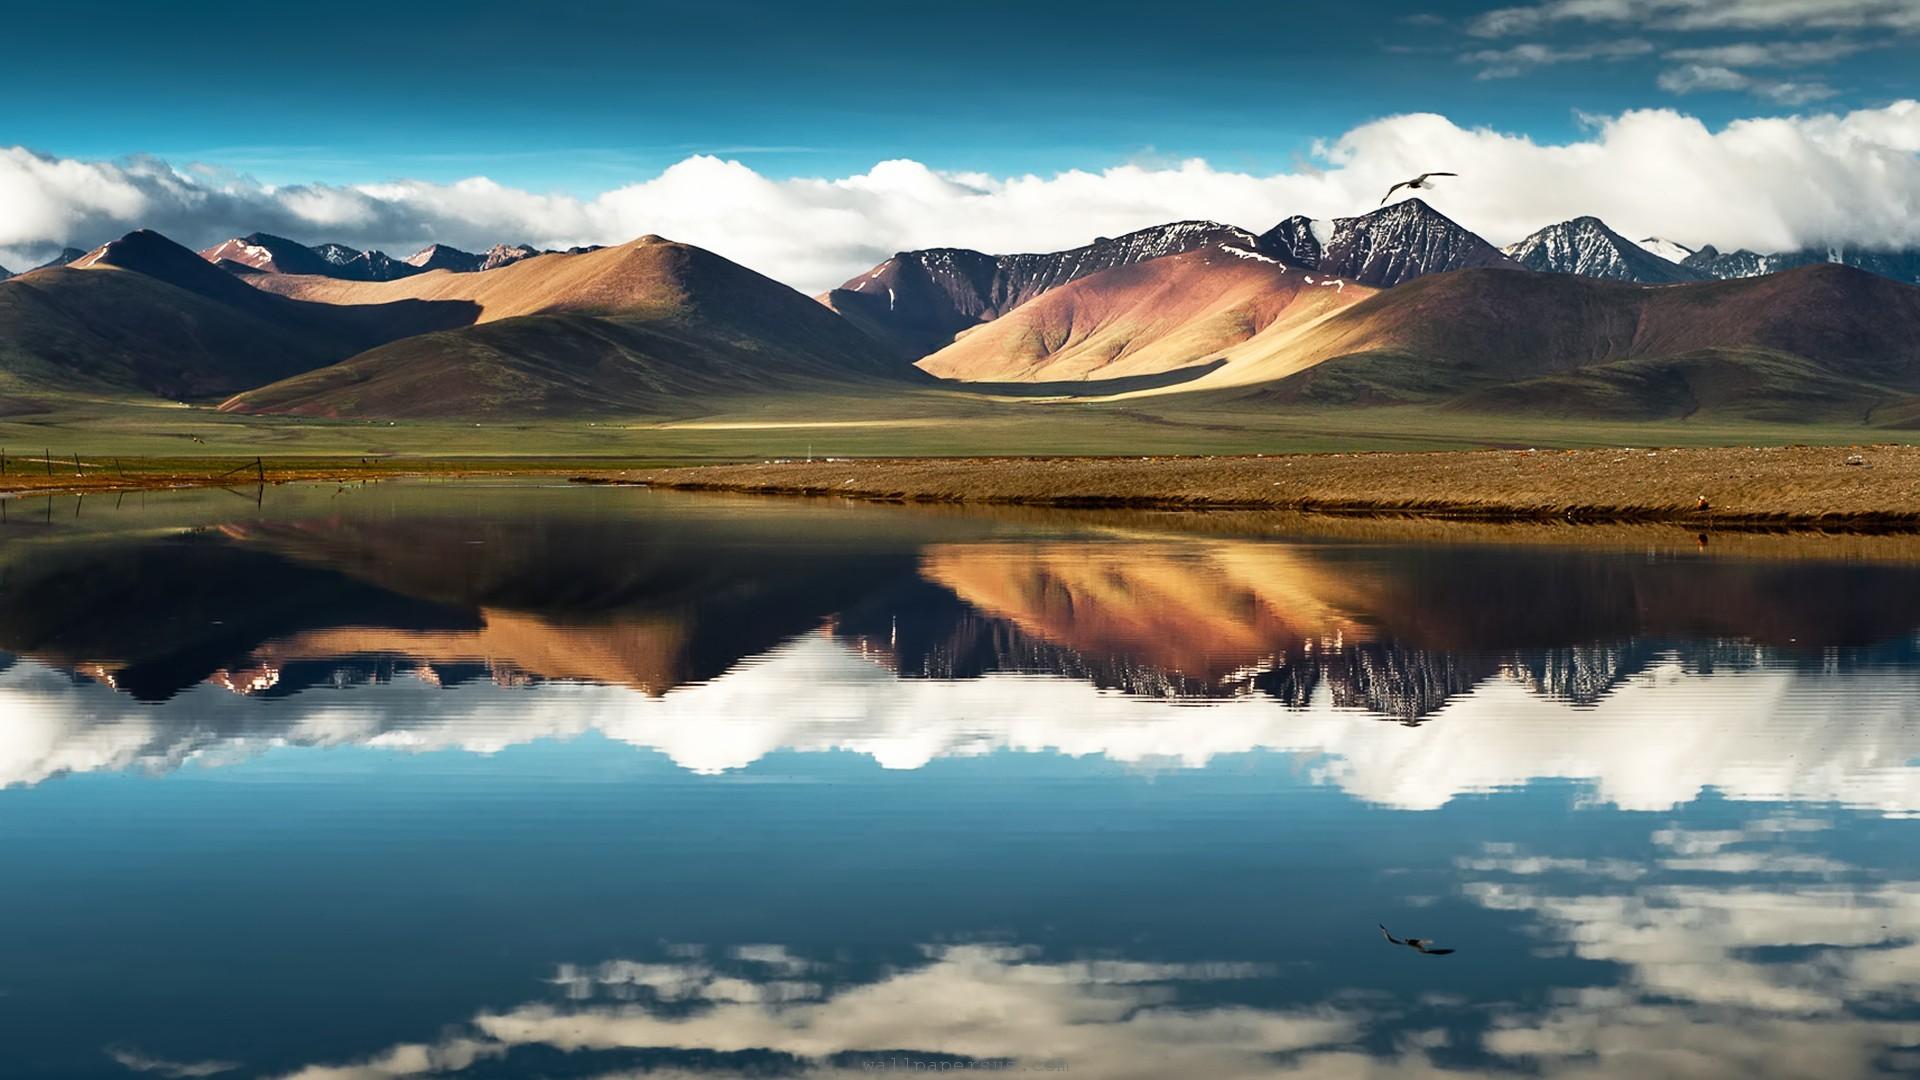 leh-ladakh-landscapes-of-lakes